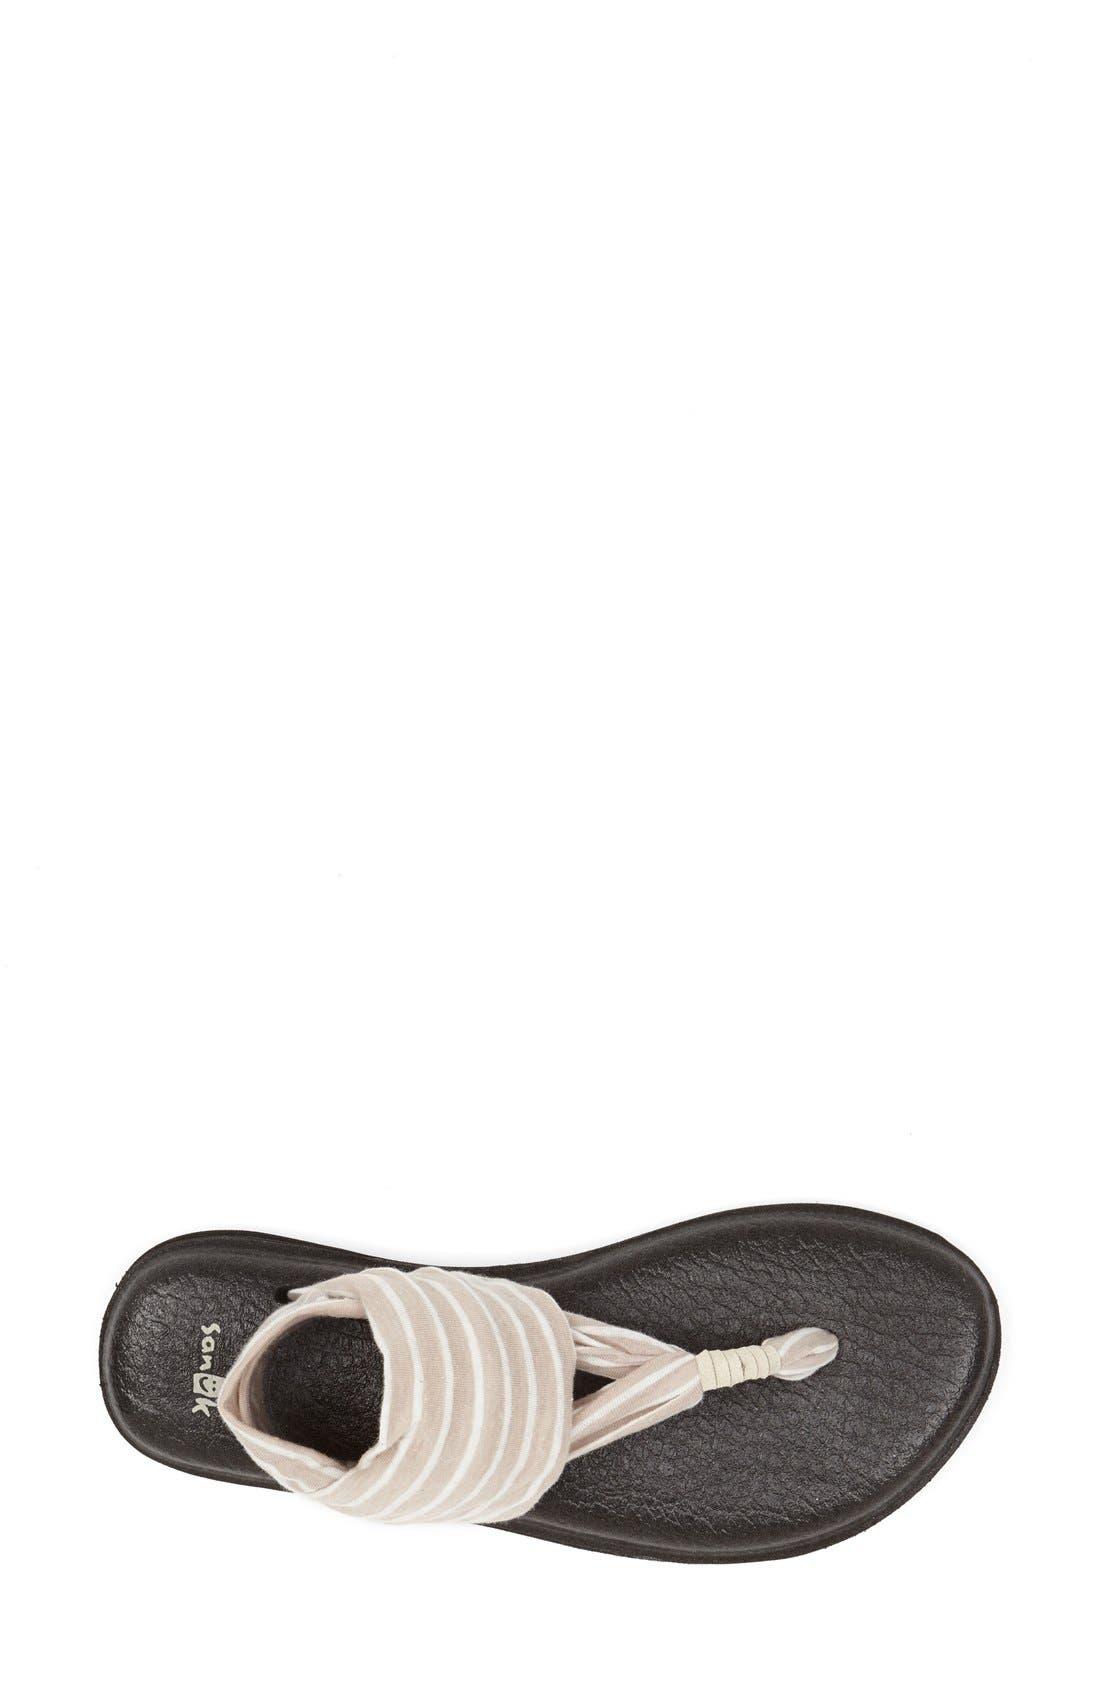 'Yoga Sling 2' Sandal,                             Alternate thumbnail 64, color,